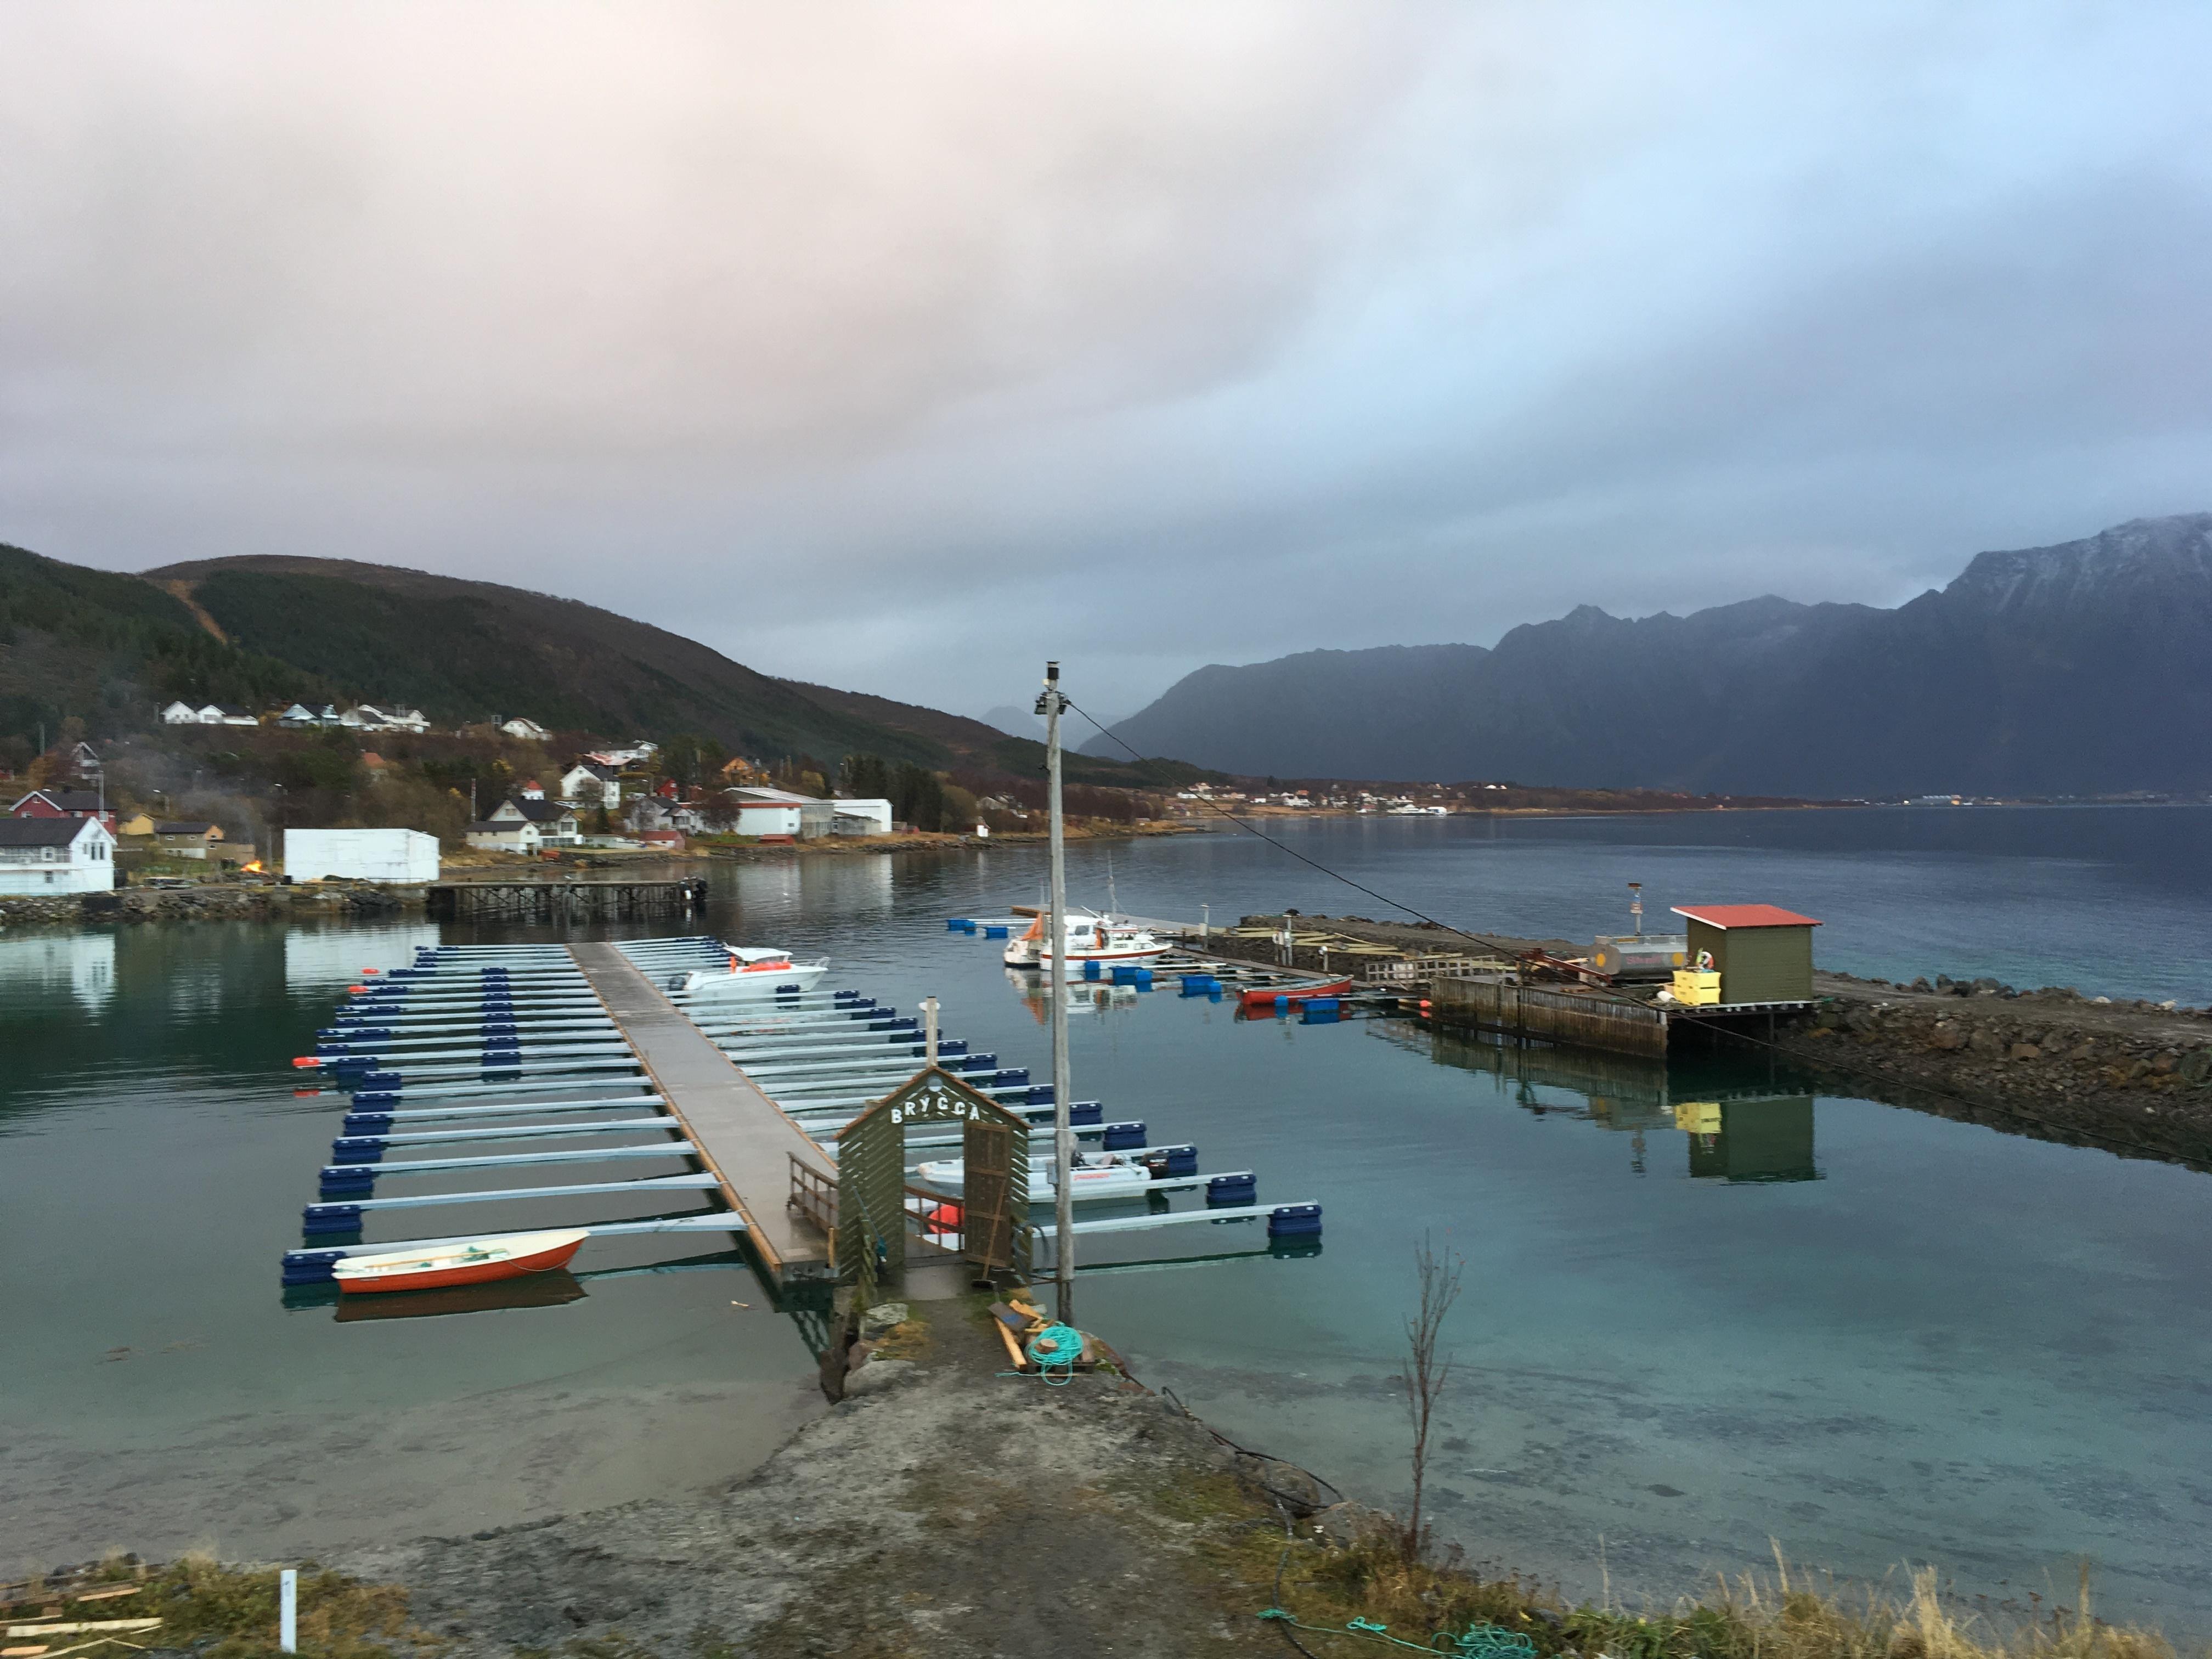 https://www.marinasolutions.no/uploads/Marina-Solutions-Drone-bilde-Maurnes-Fiske-og-Småbåtforening2.JPG